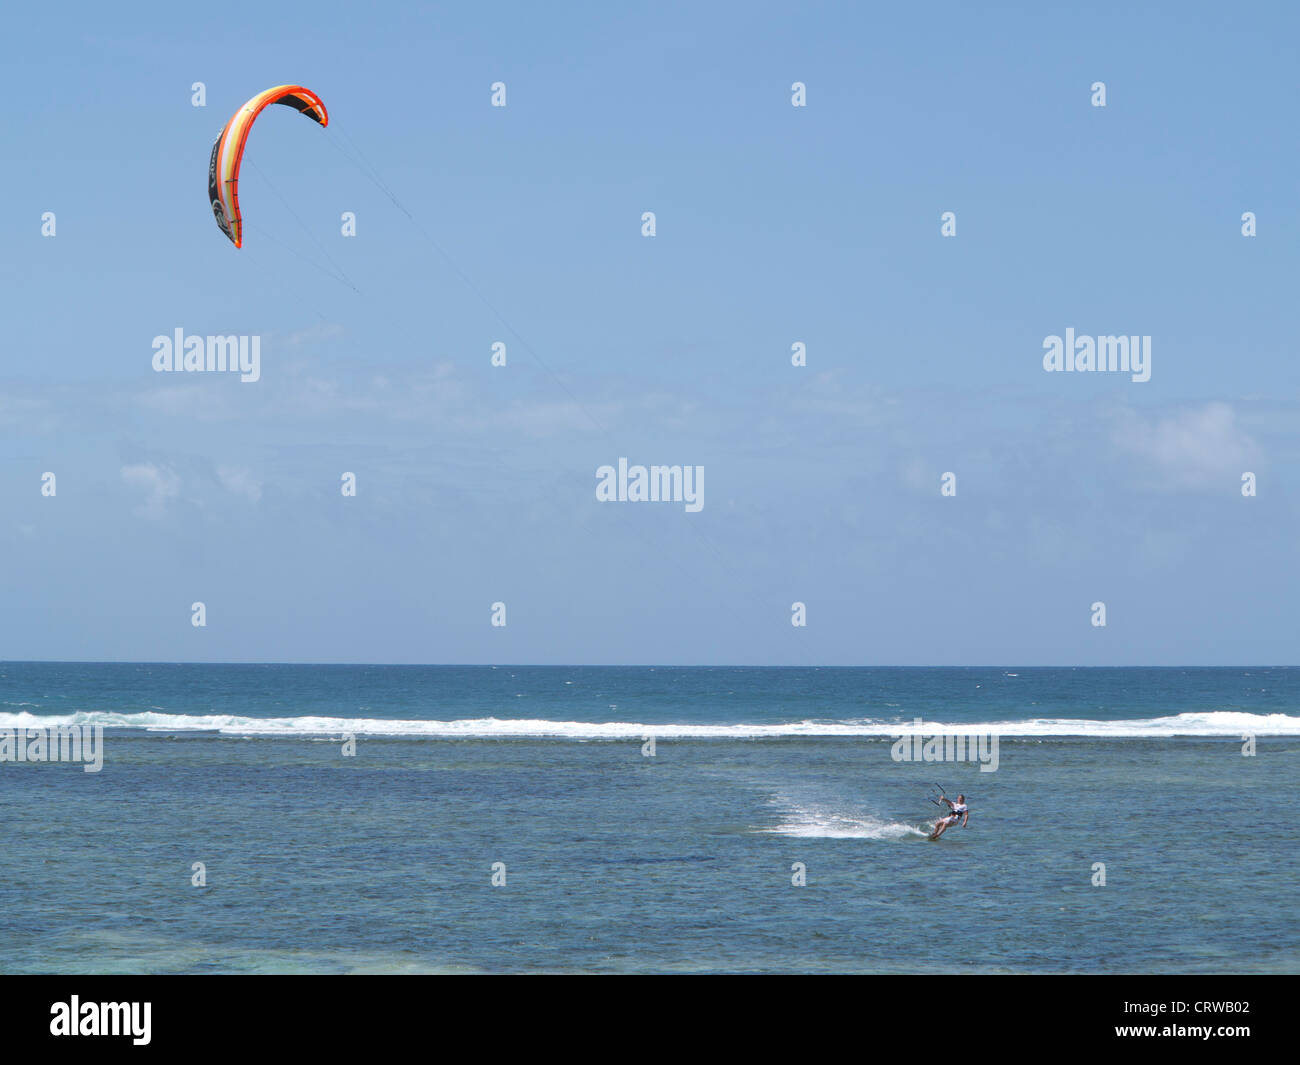 Tourist wind surfing on the beach at Tiwi, on Indian Ocean coast, Kenya - Stock Image